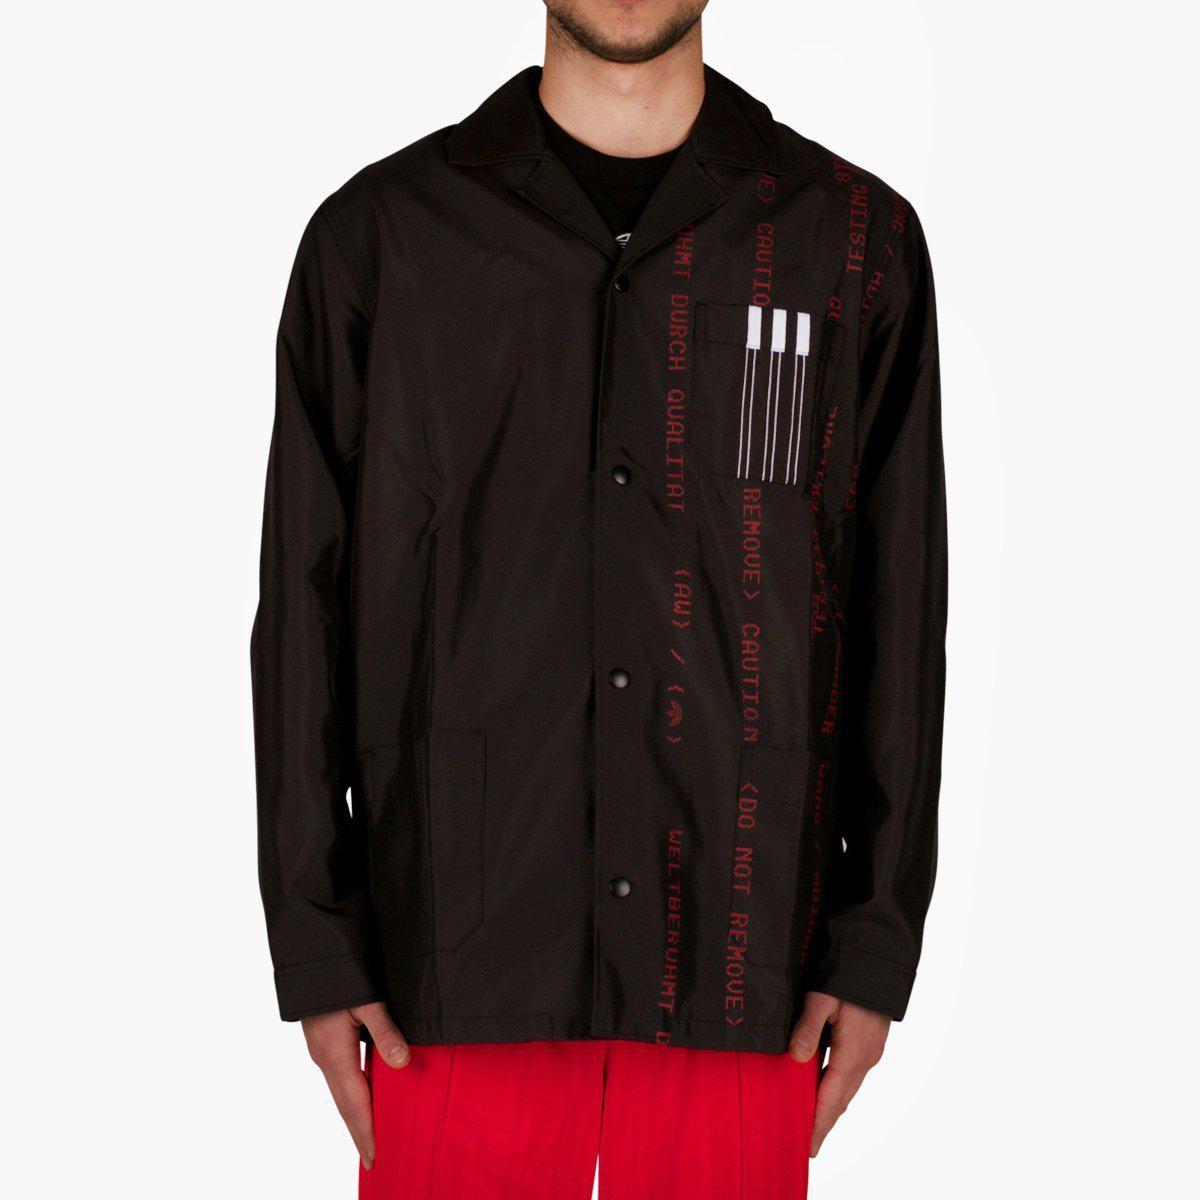 73f95ee02 adidas Originals. Men s Black Adidas Originals By Alexander Wang Coach  Jacket